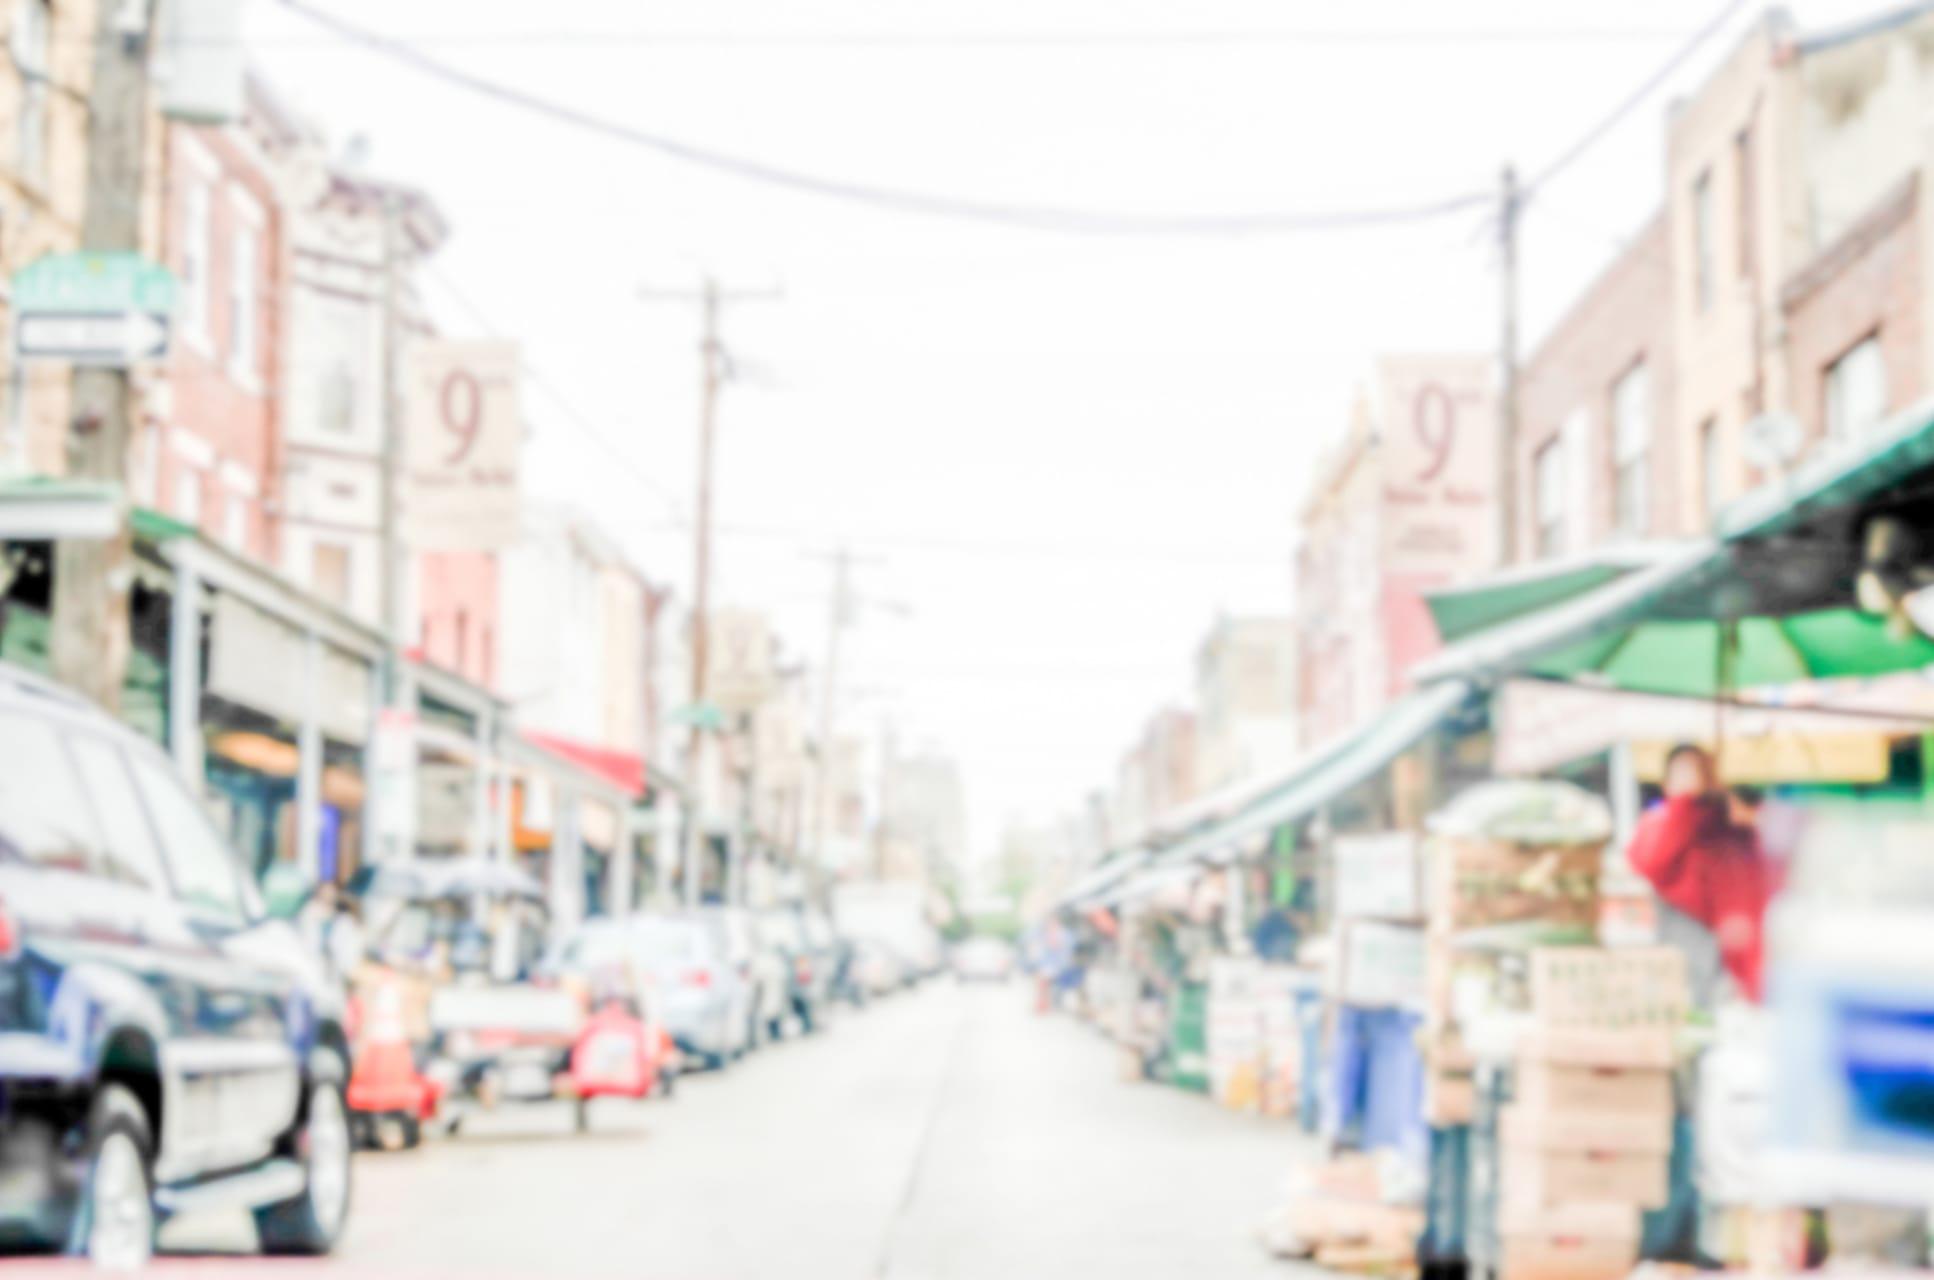 Philadelphia - The Italian Market: Old Immigrant Community through New Immigrant Eyes